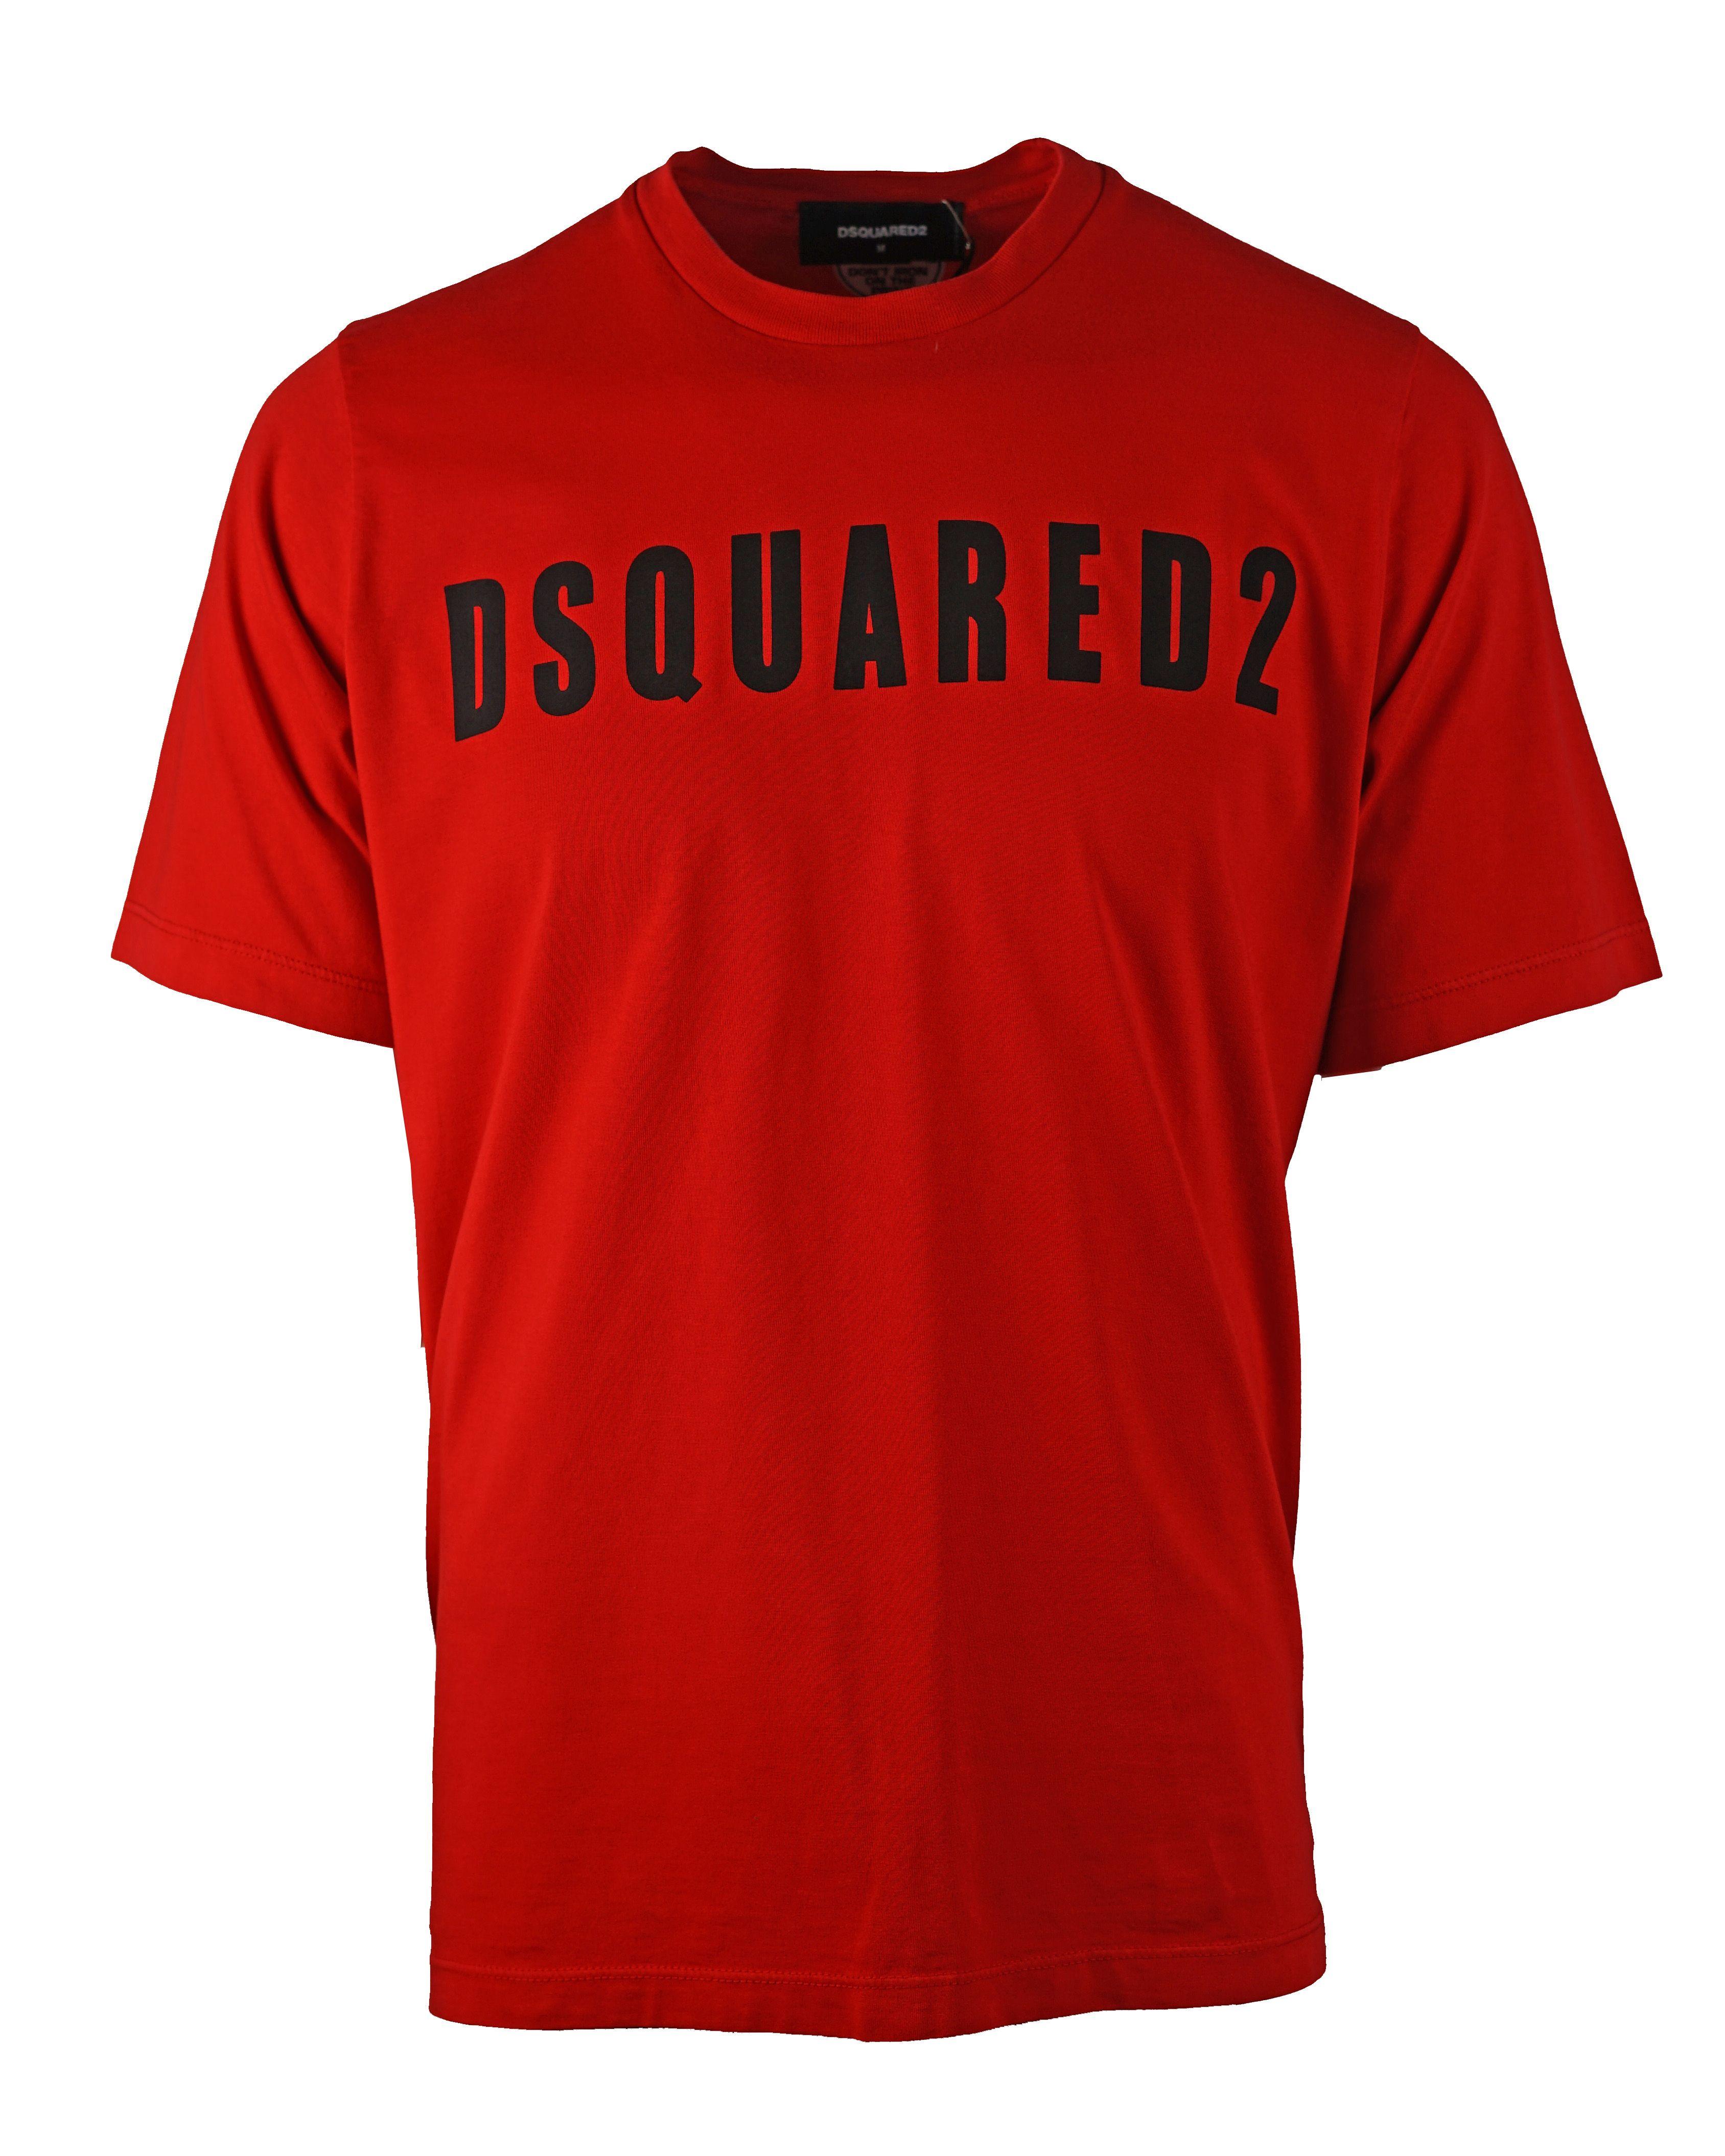 DSquared2 S74GD0472 S20694 307 T-Shirt